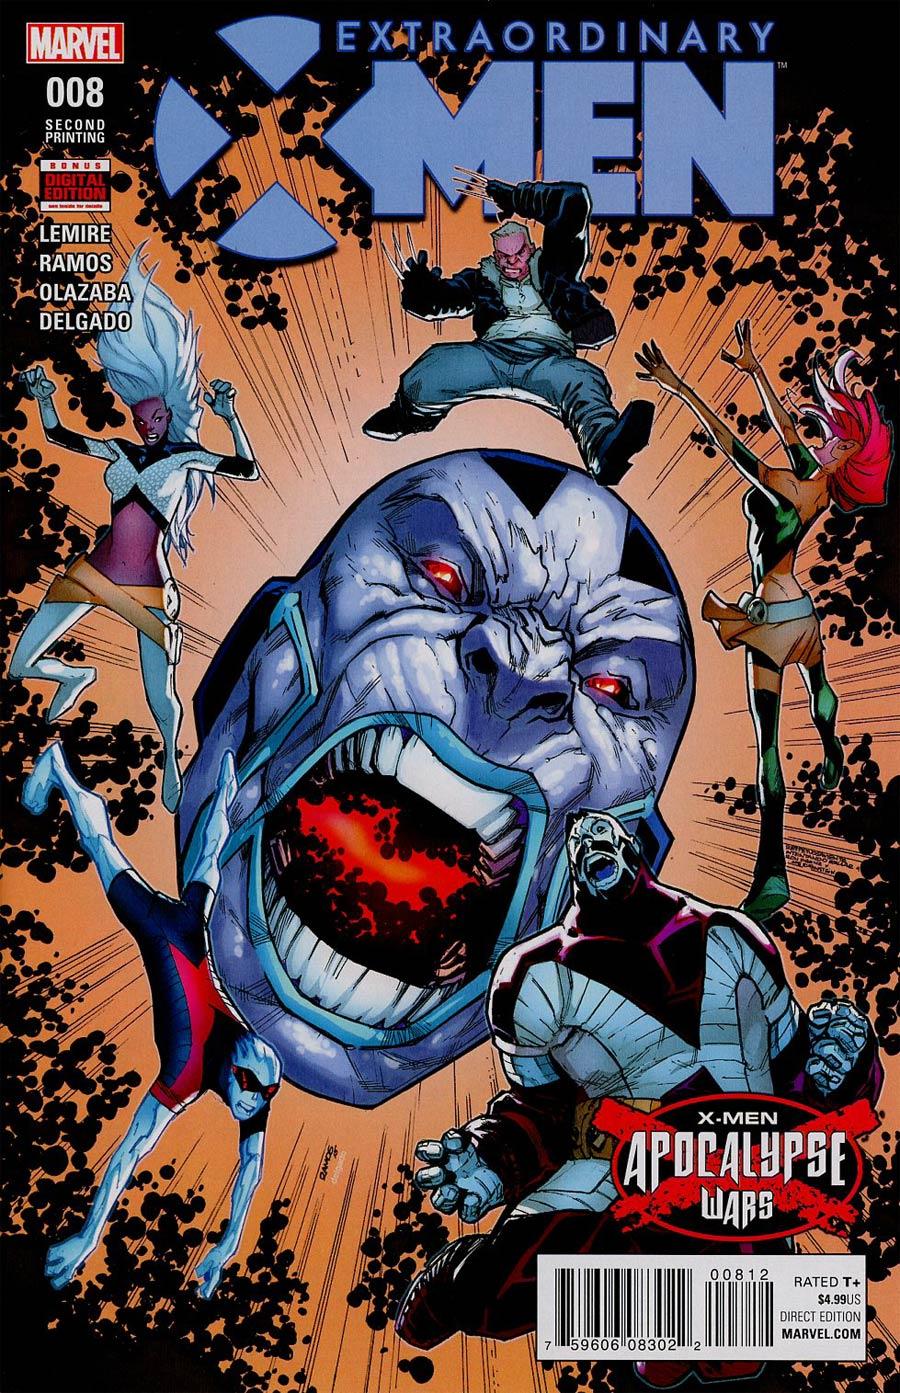 Extraordinary X-Men #8 Cover F 2nd Ptg Humberto Ramos Variant Cover (X-Men Apocalypse Wars Tie-In)